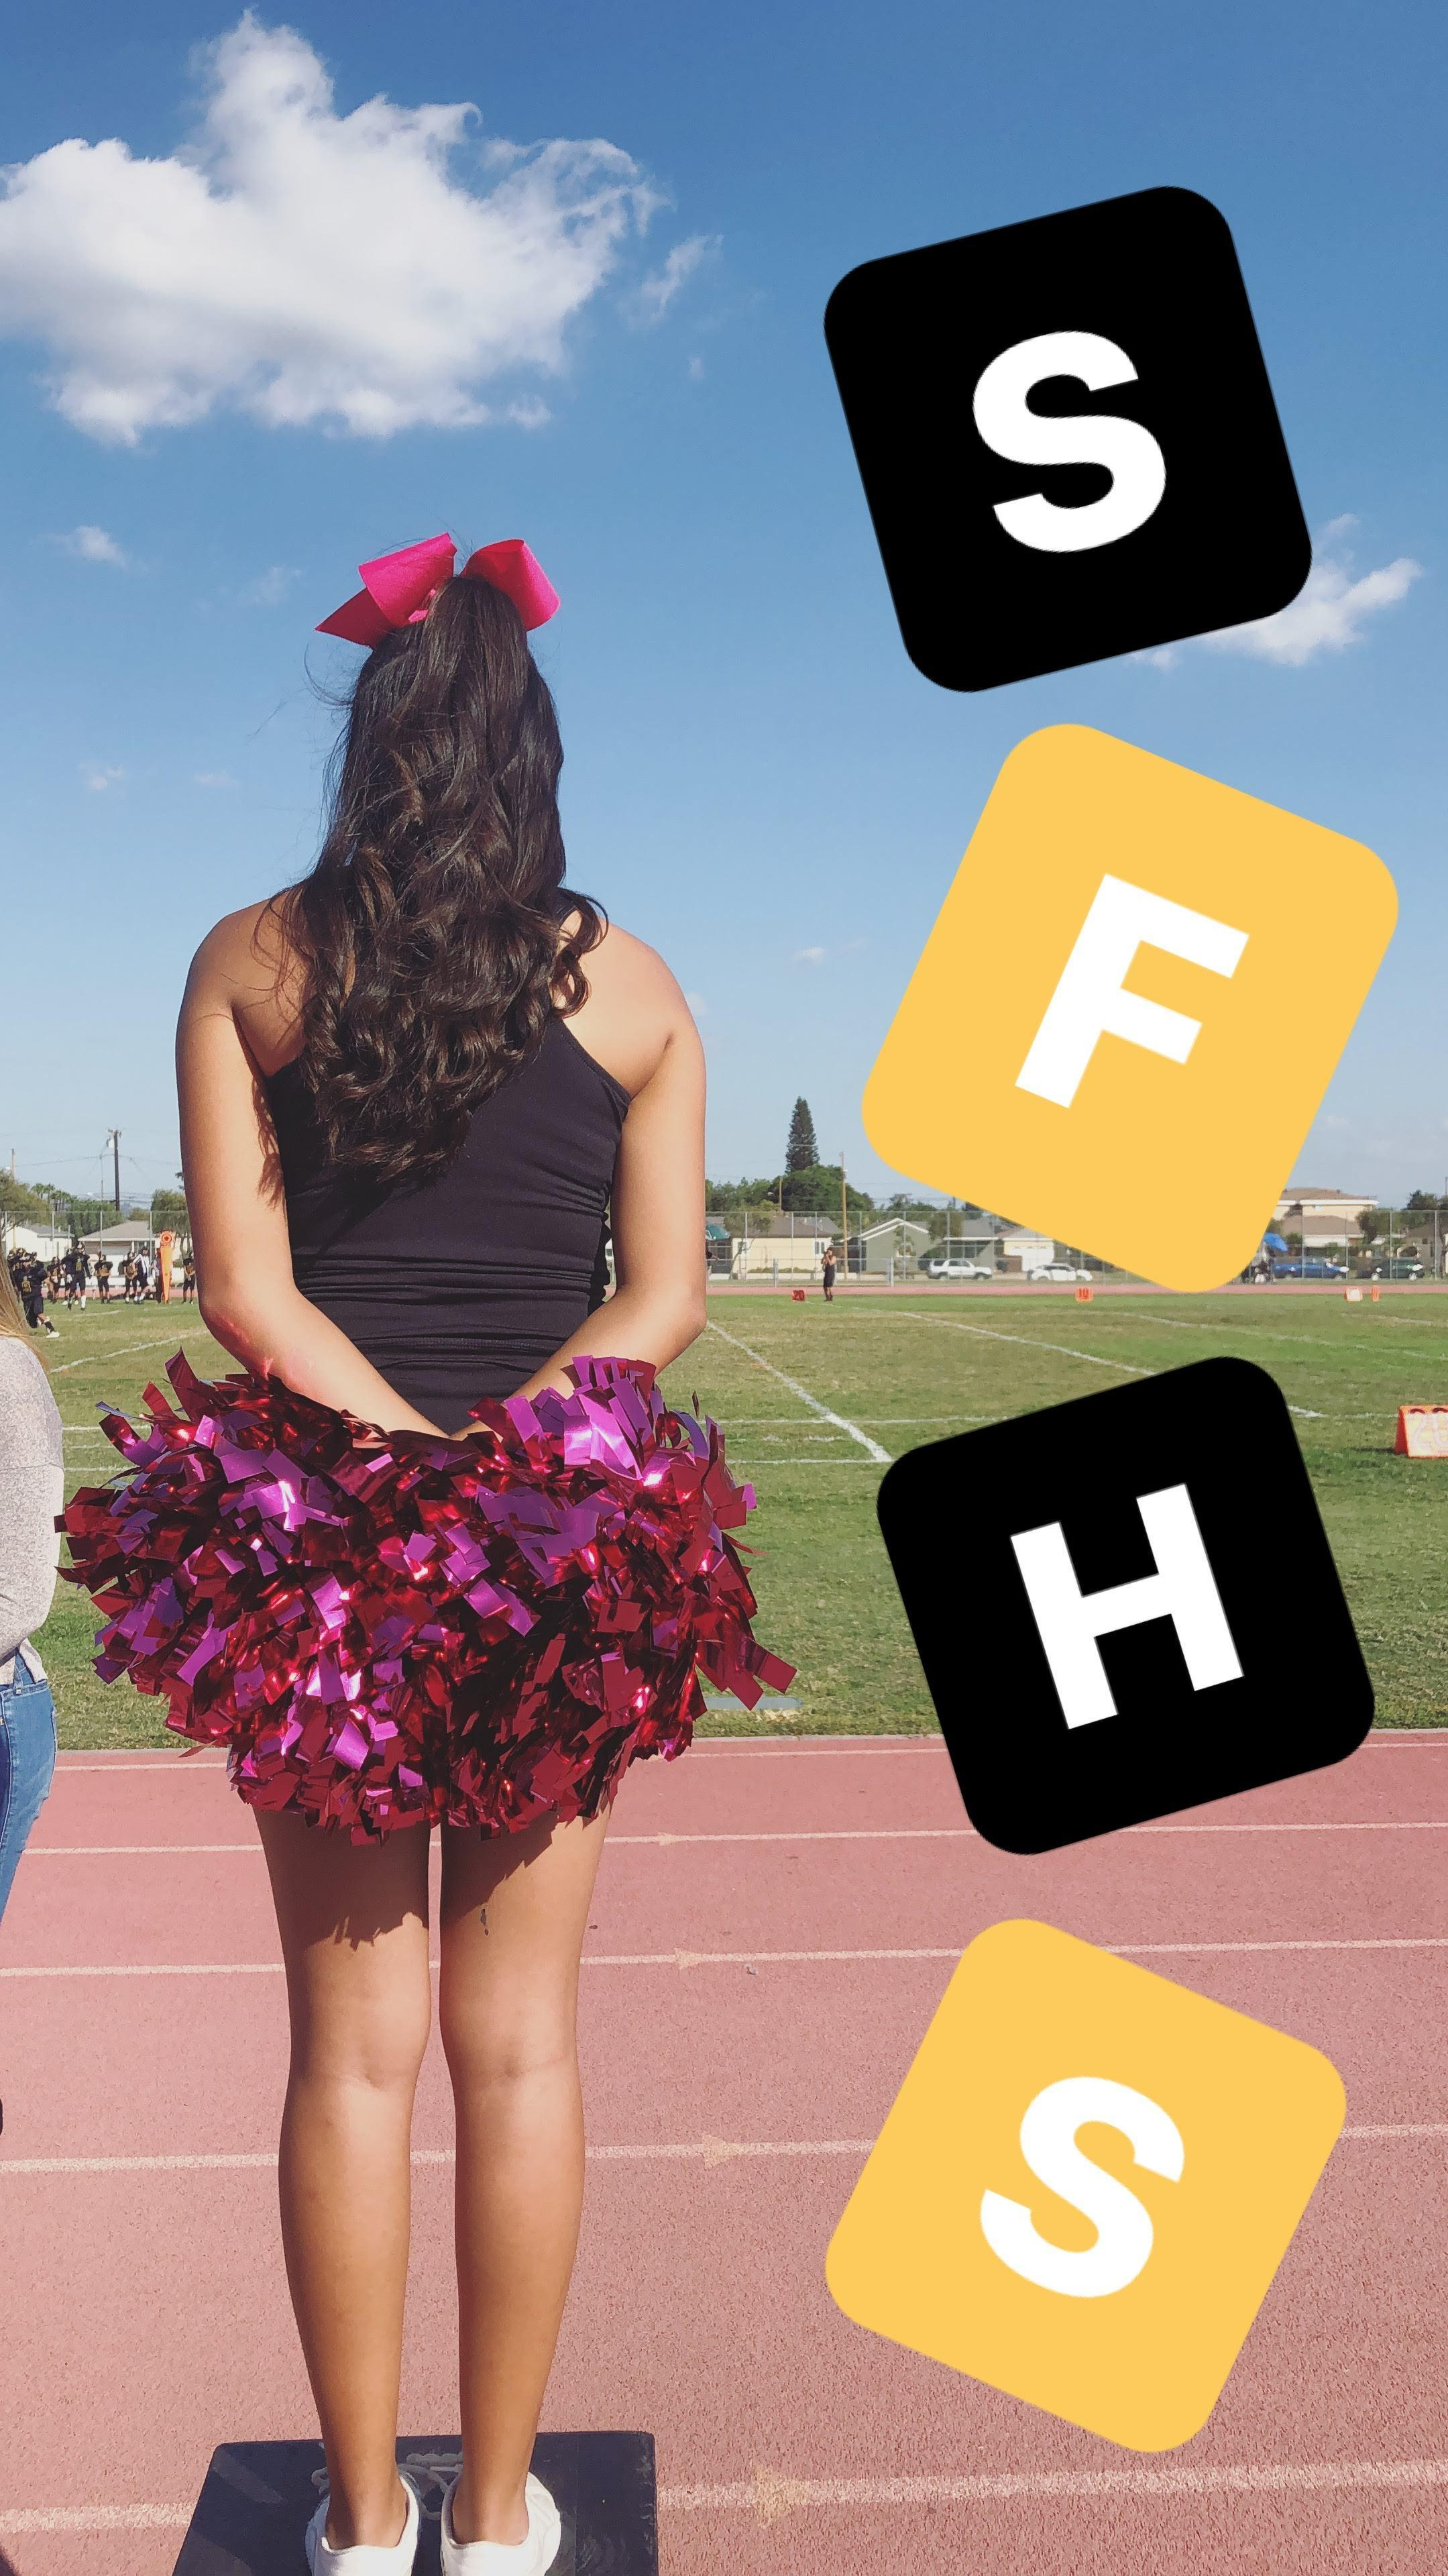 jv cheerleader at game